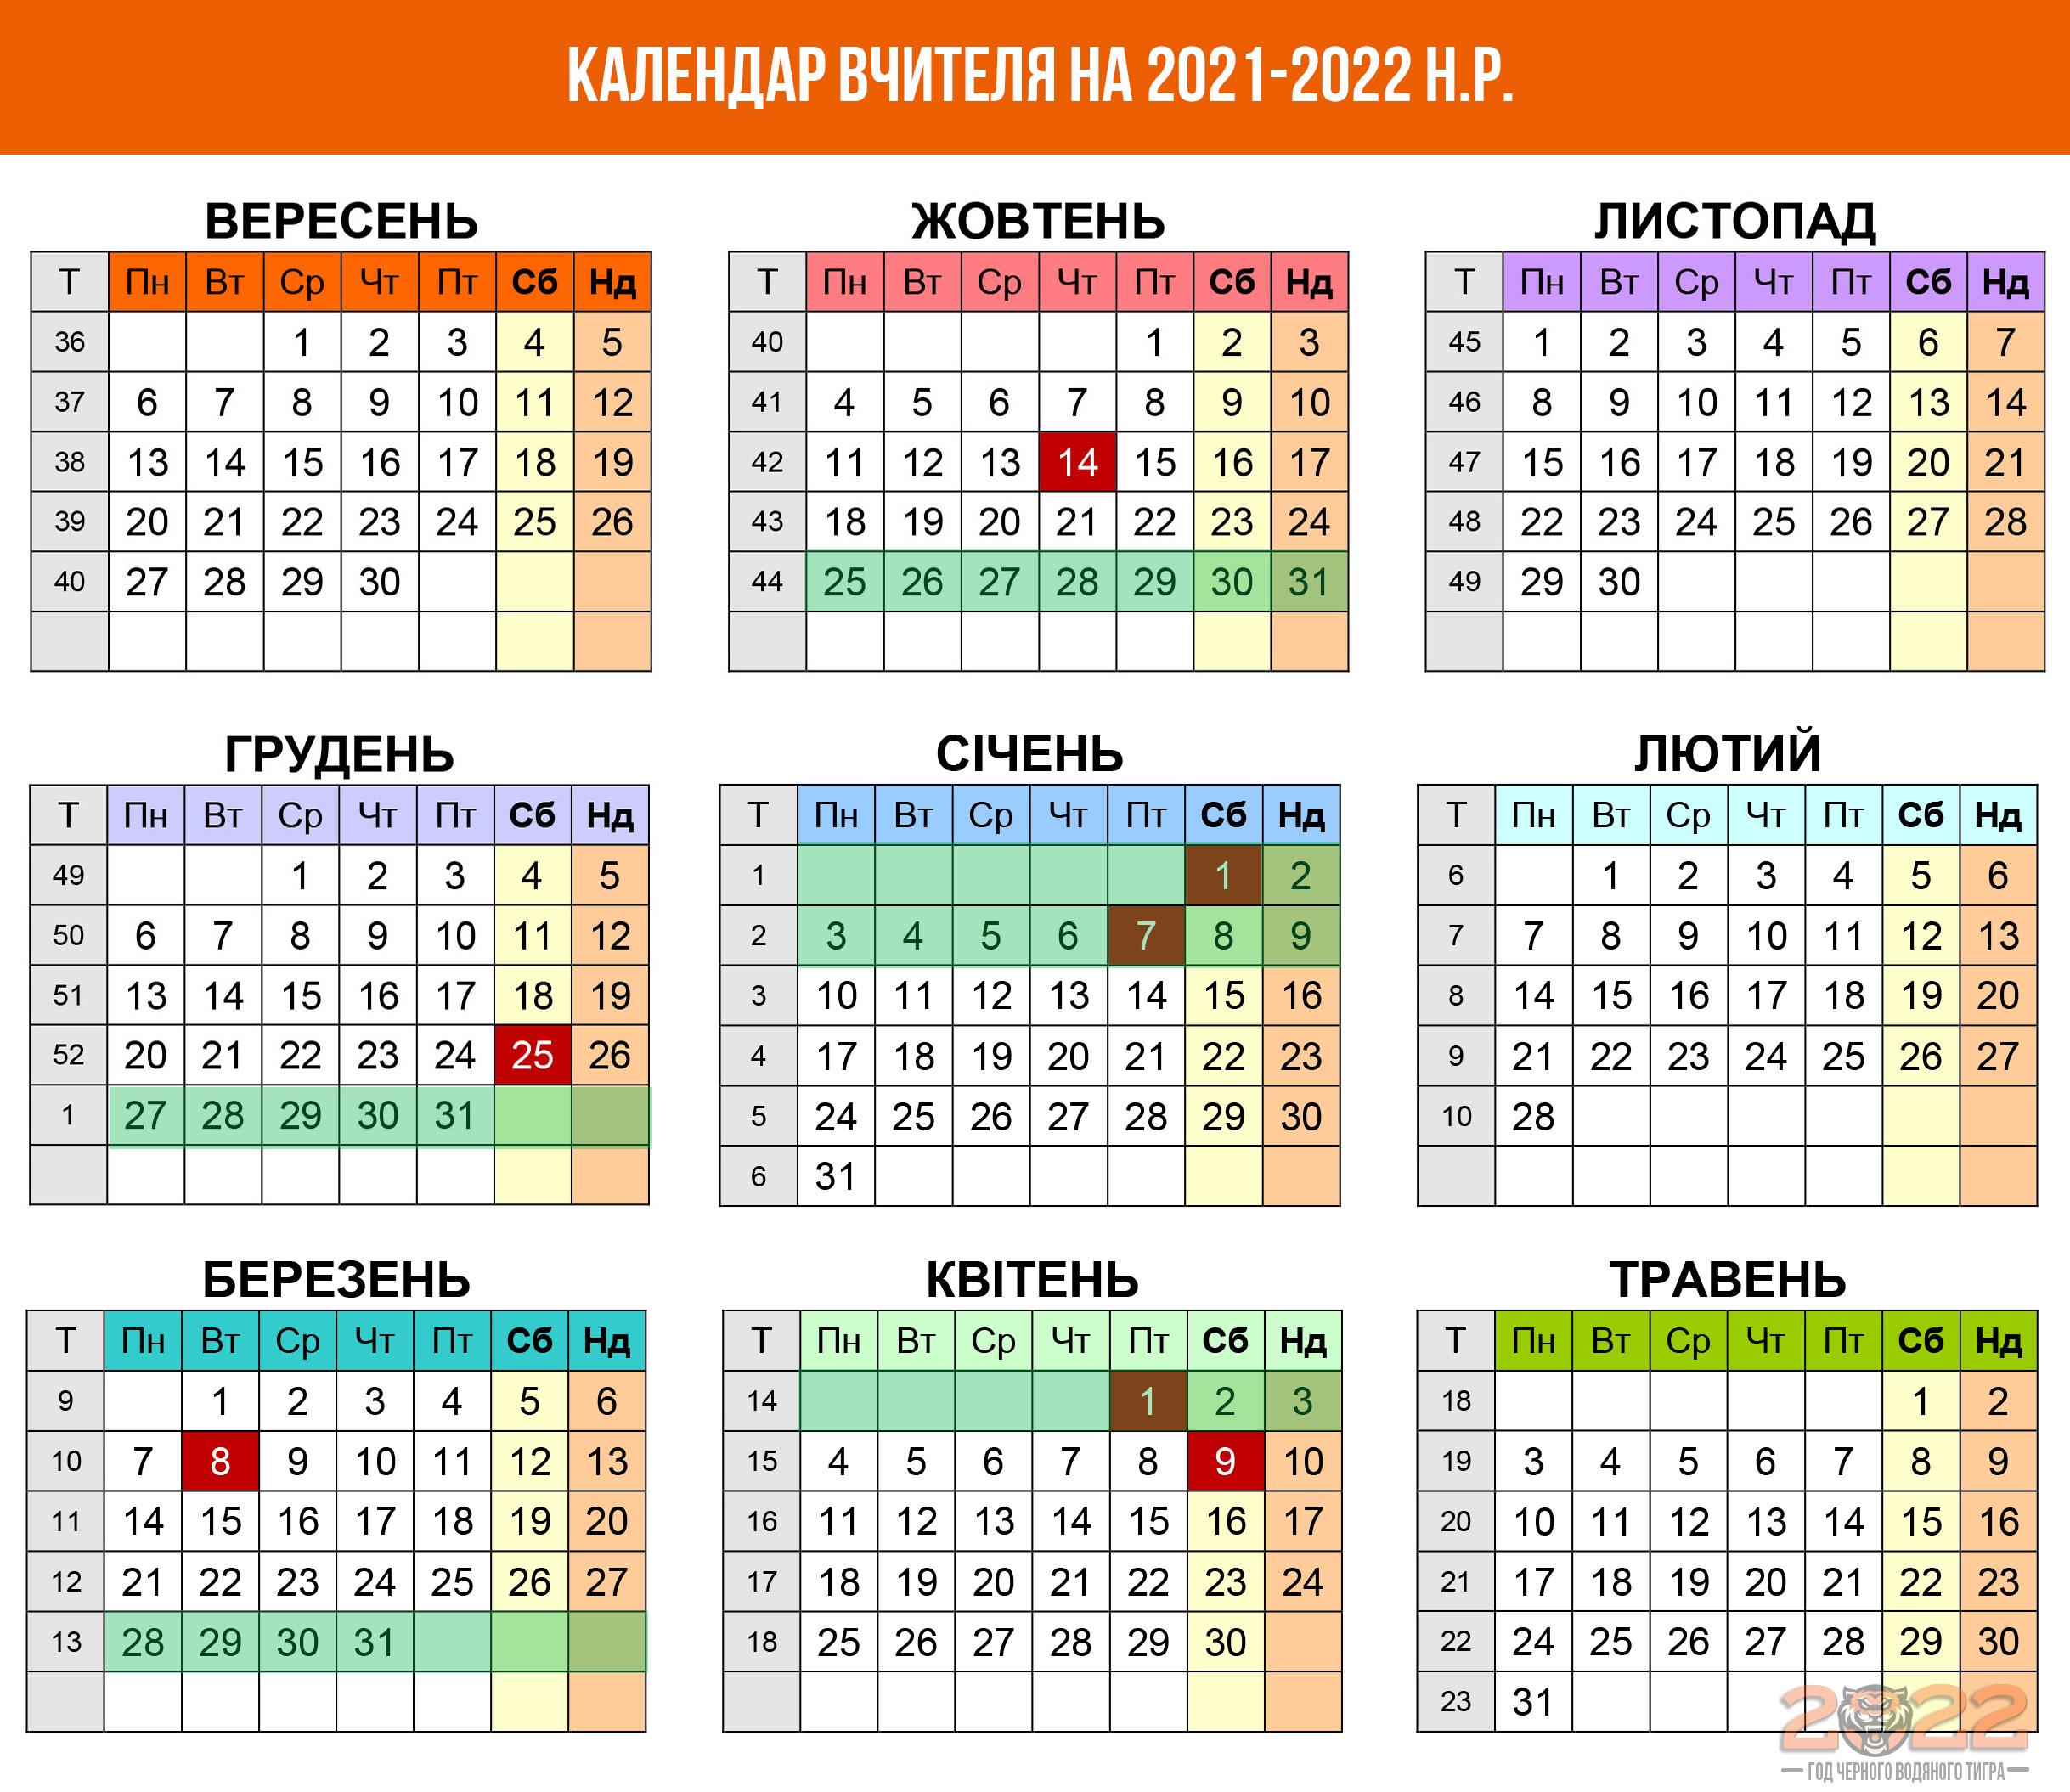 Календарь школьника, календарь учителя 2021-2022 с датами каникул